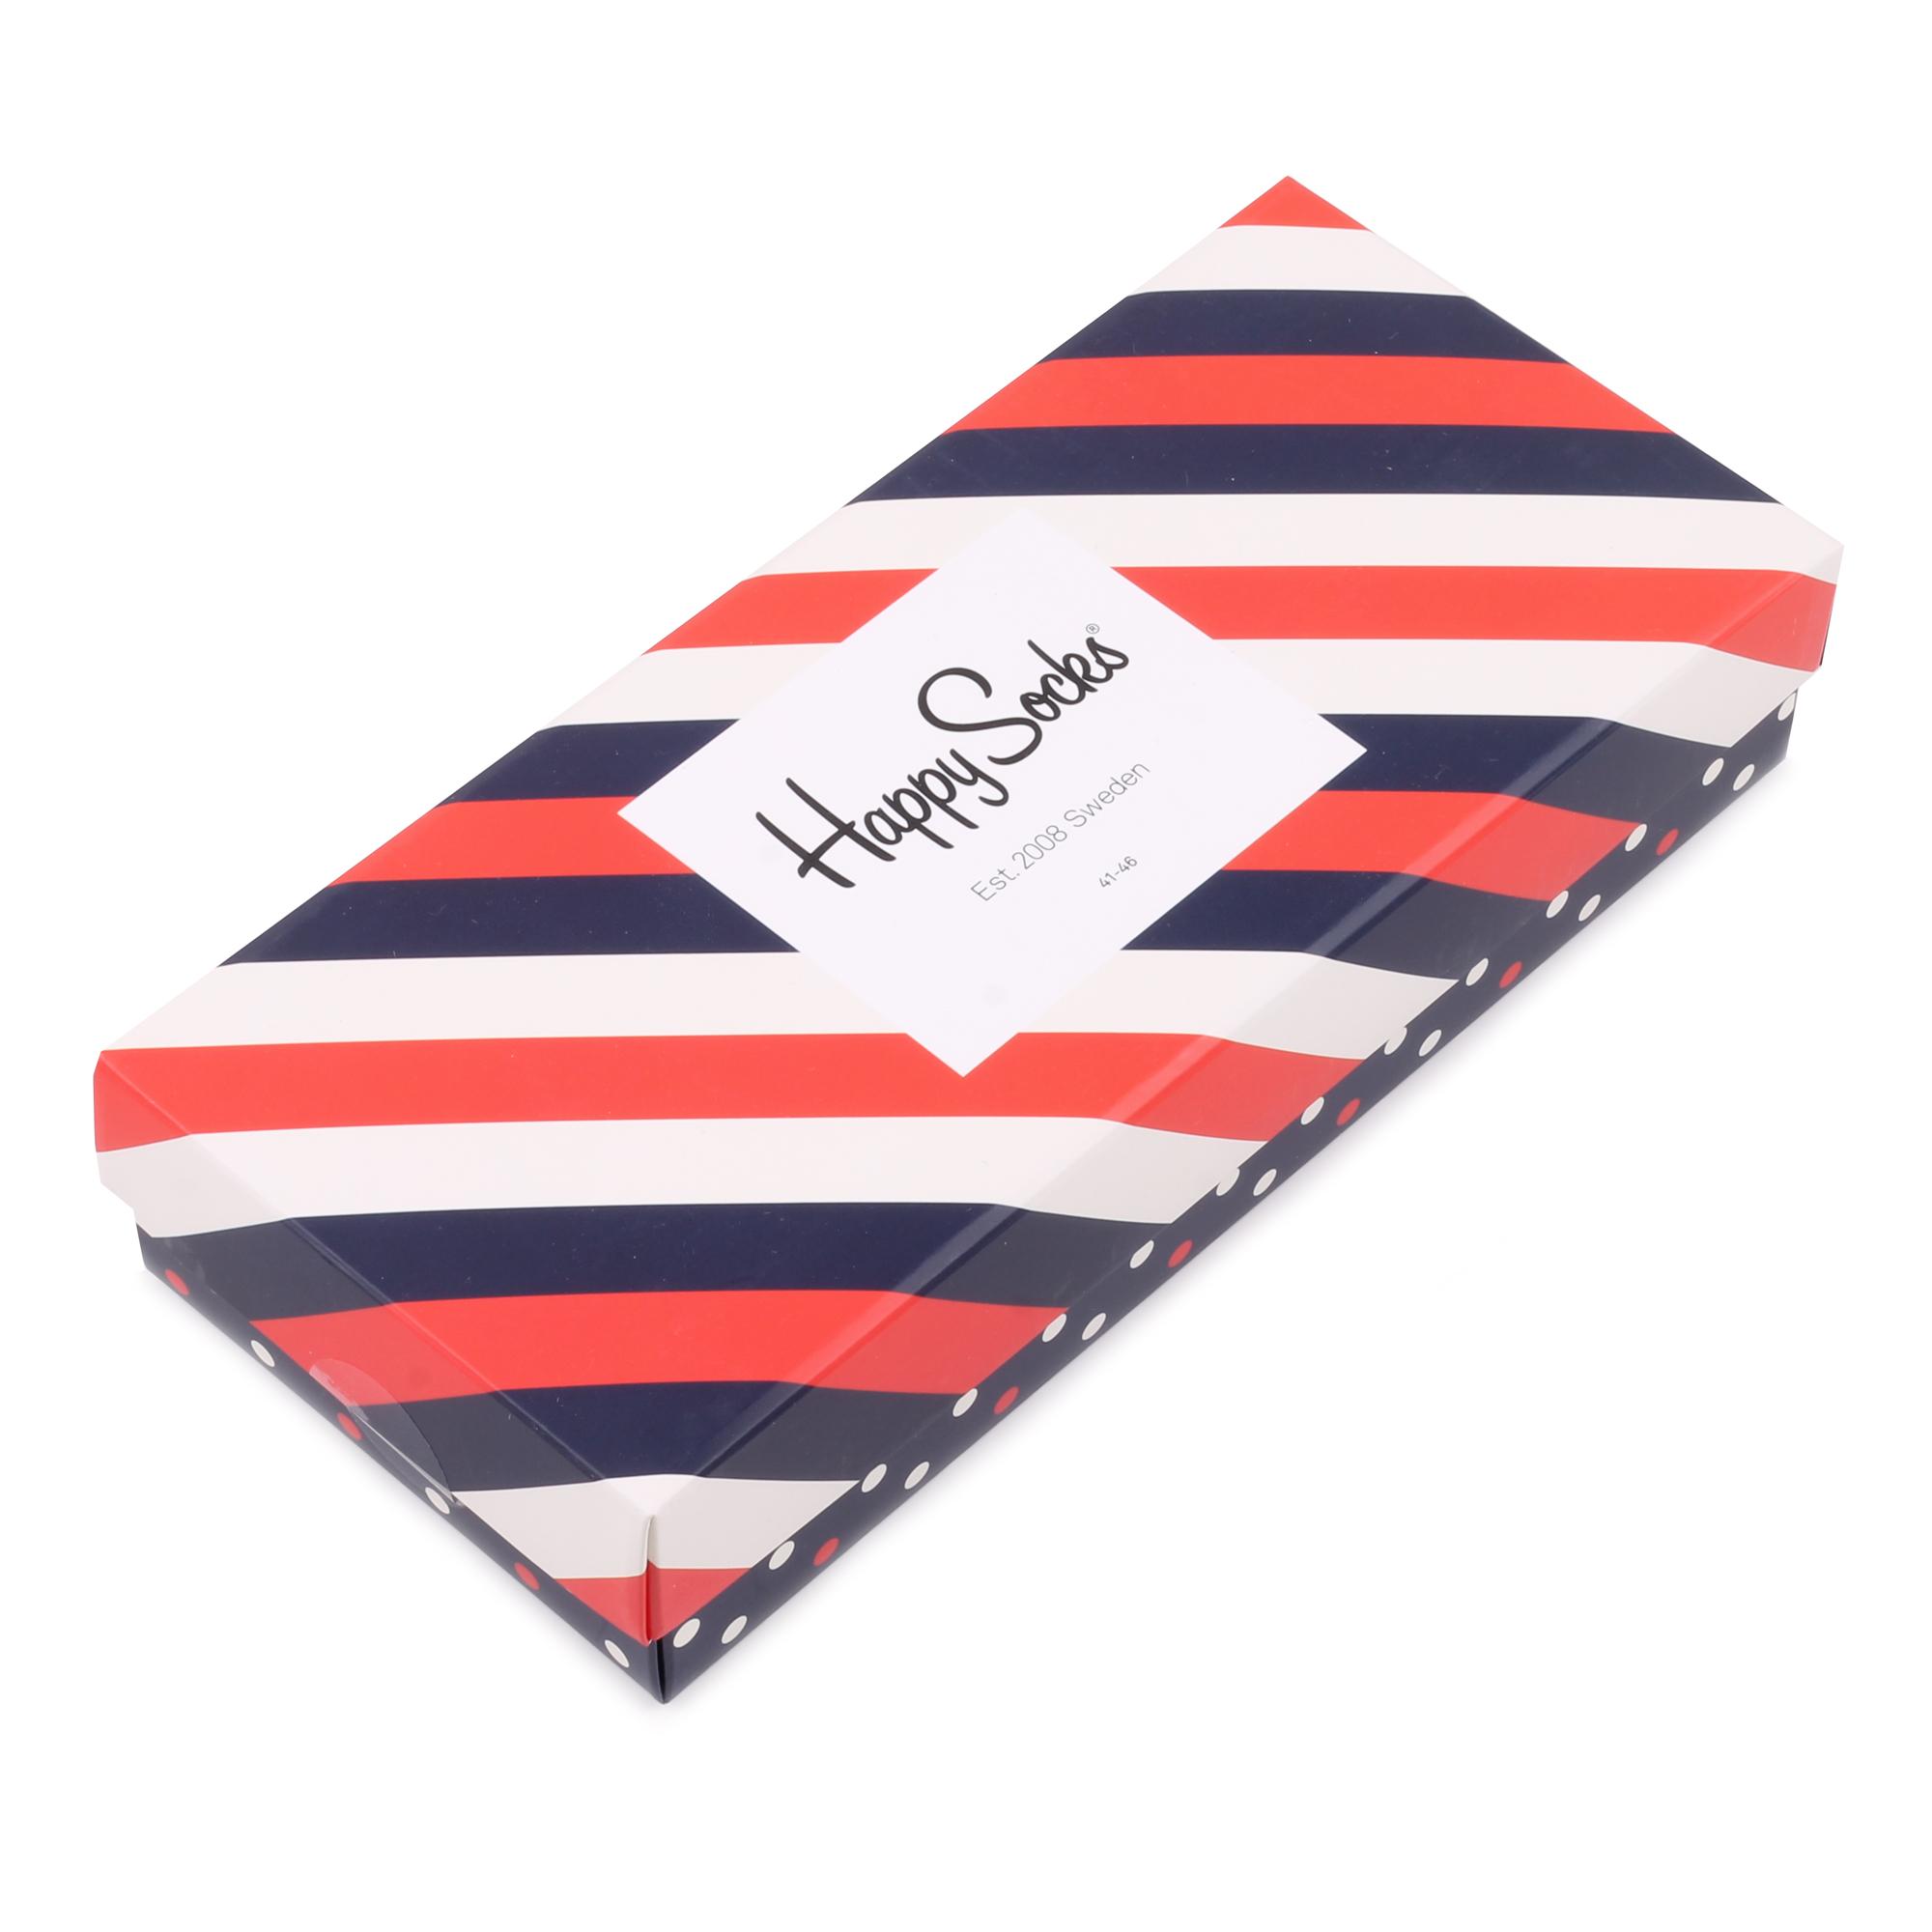 Подарочный набор носков унисекс Happy Socks Stripe Filled Optic 4 Pair Pack красный 41-46